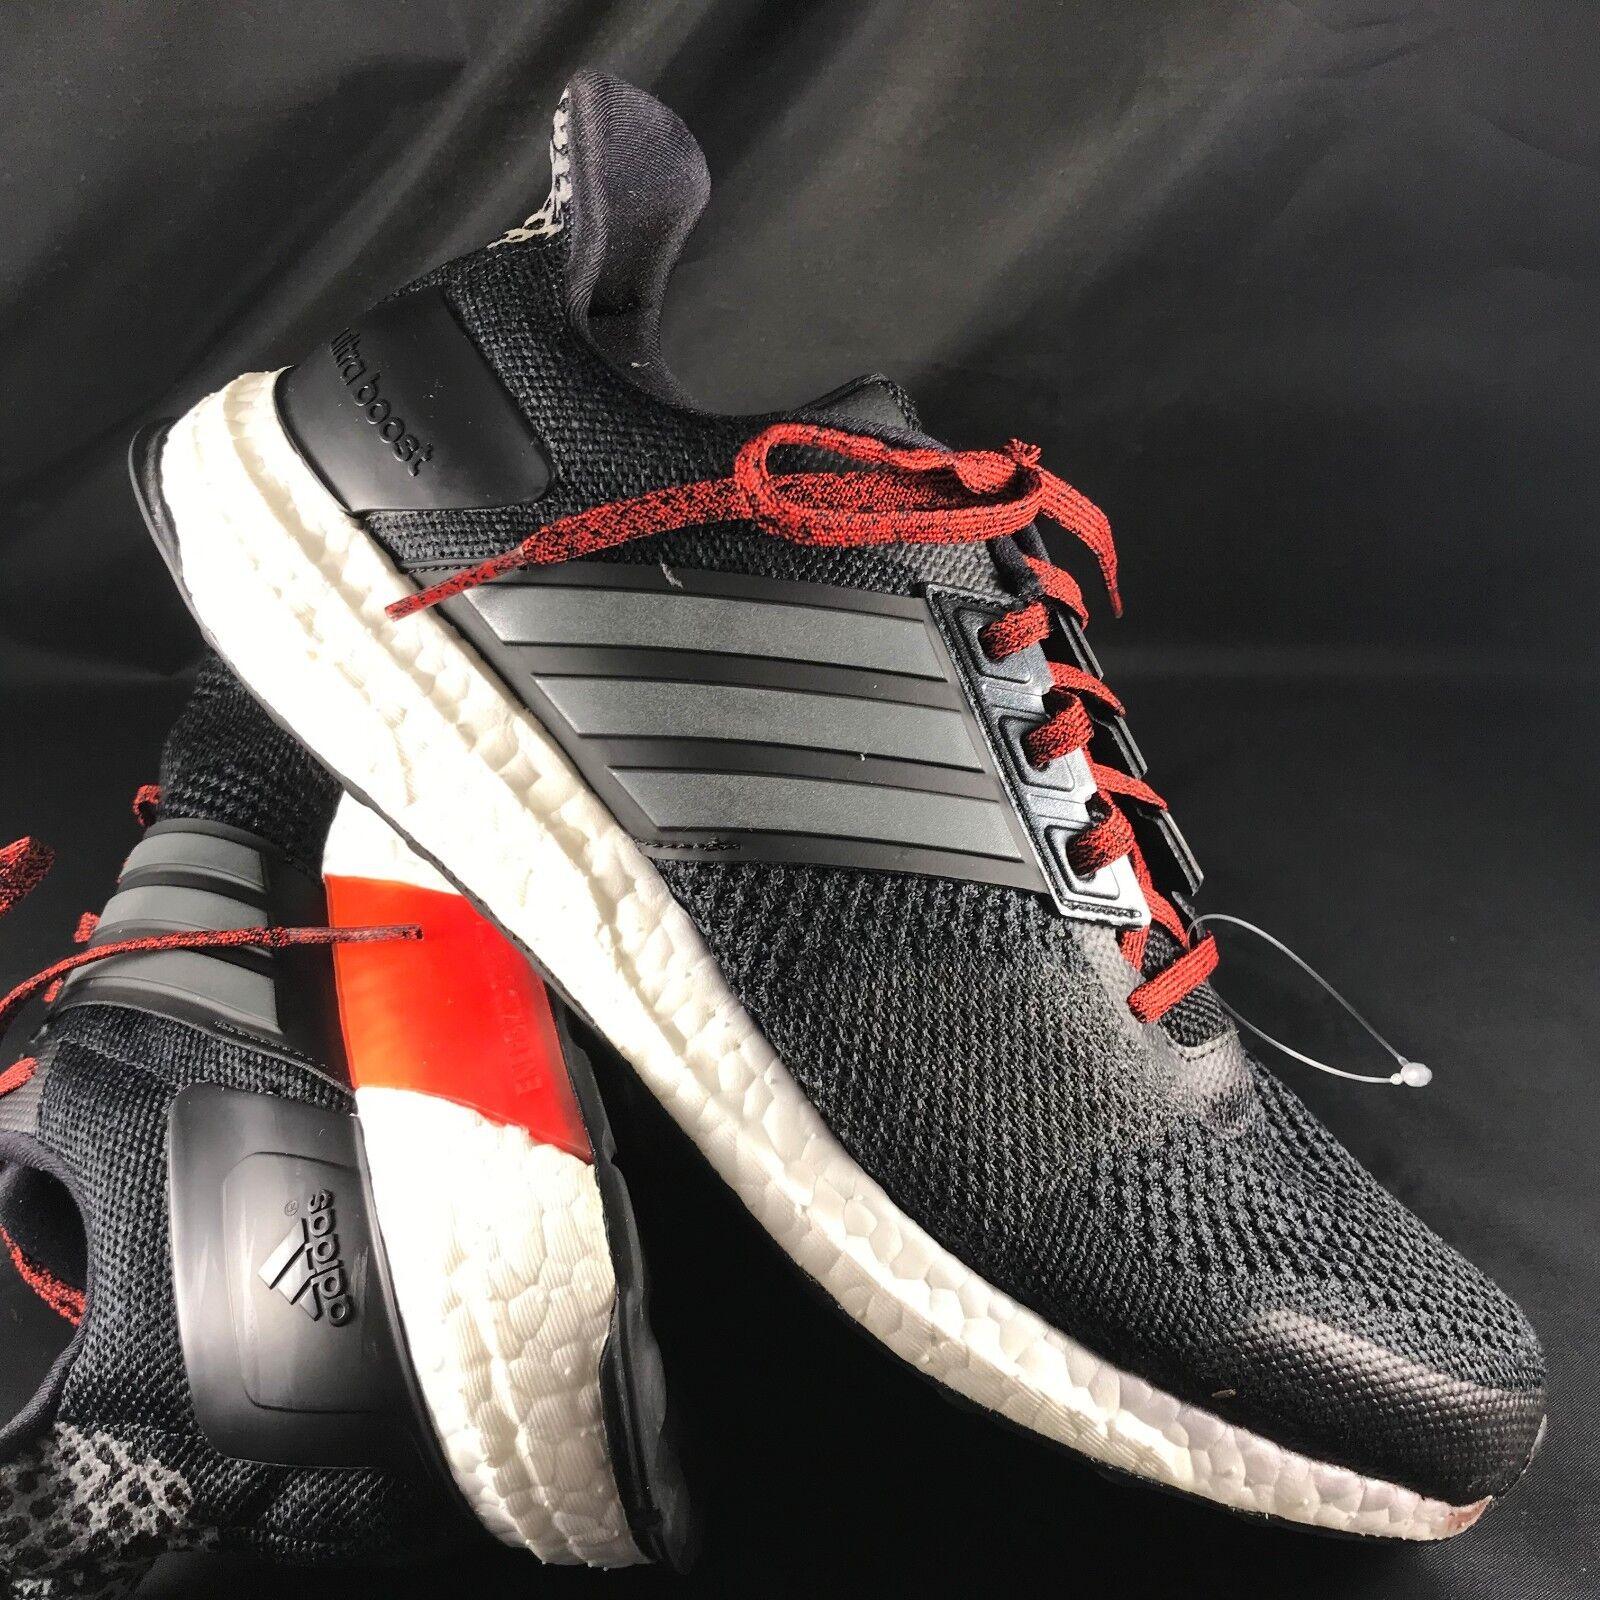 Details about [AF6518] Mens Adidas Ultra Boost ST M Running Sneaker Black Iron Red Kanye